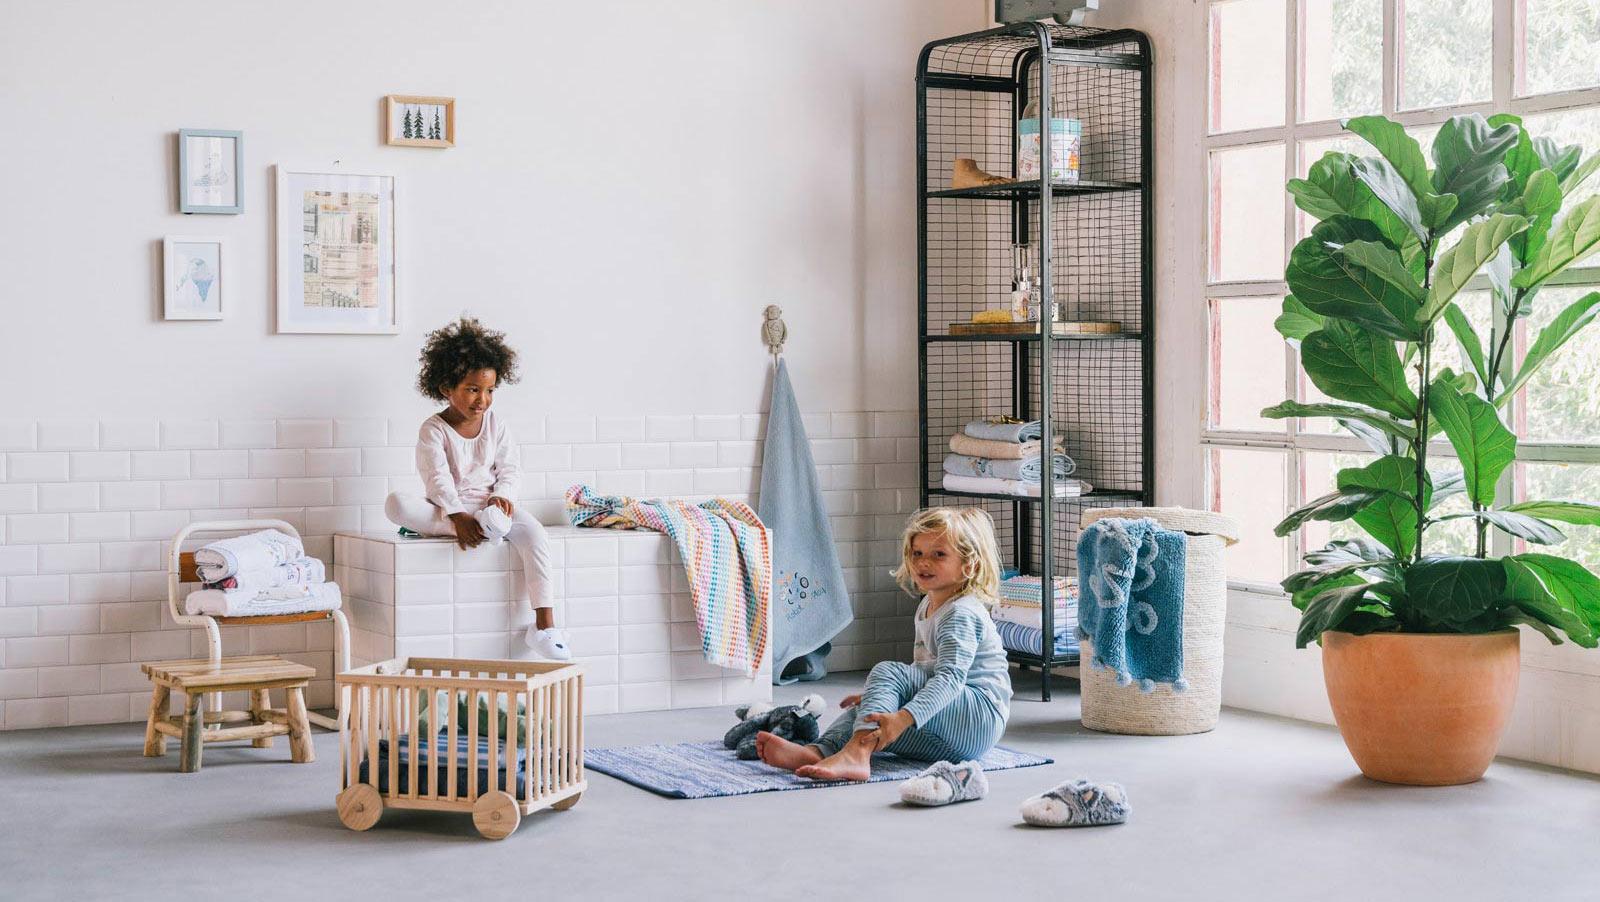 maituins. Black Bedroom Furniture Sets. Home Design Ideas